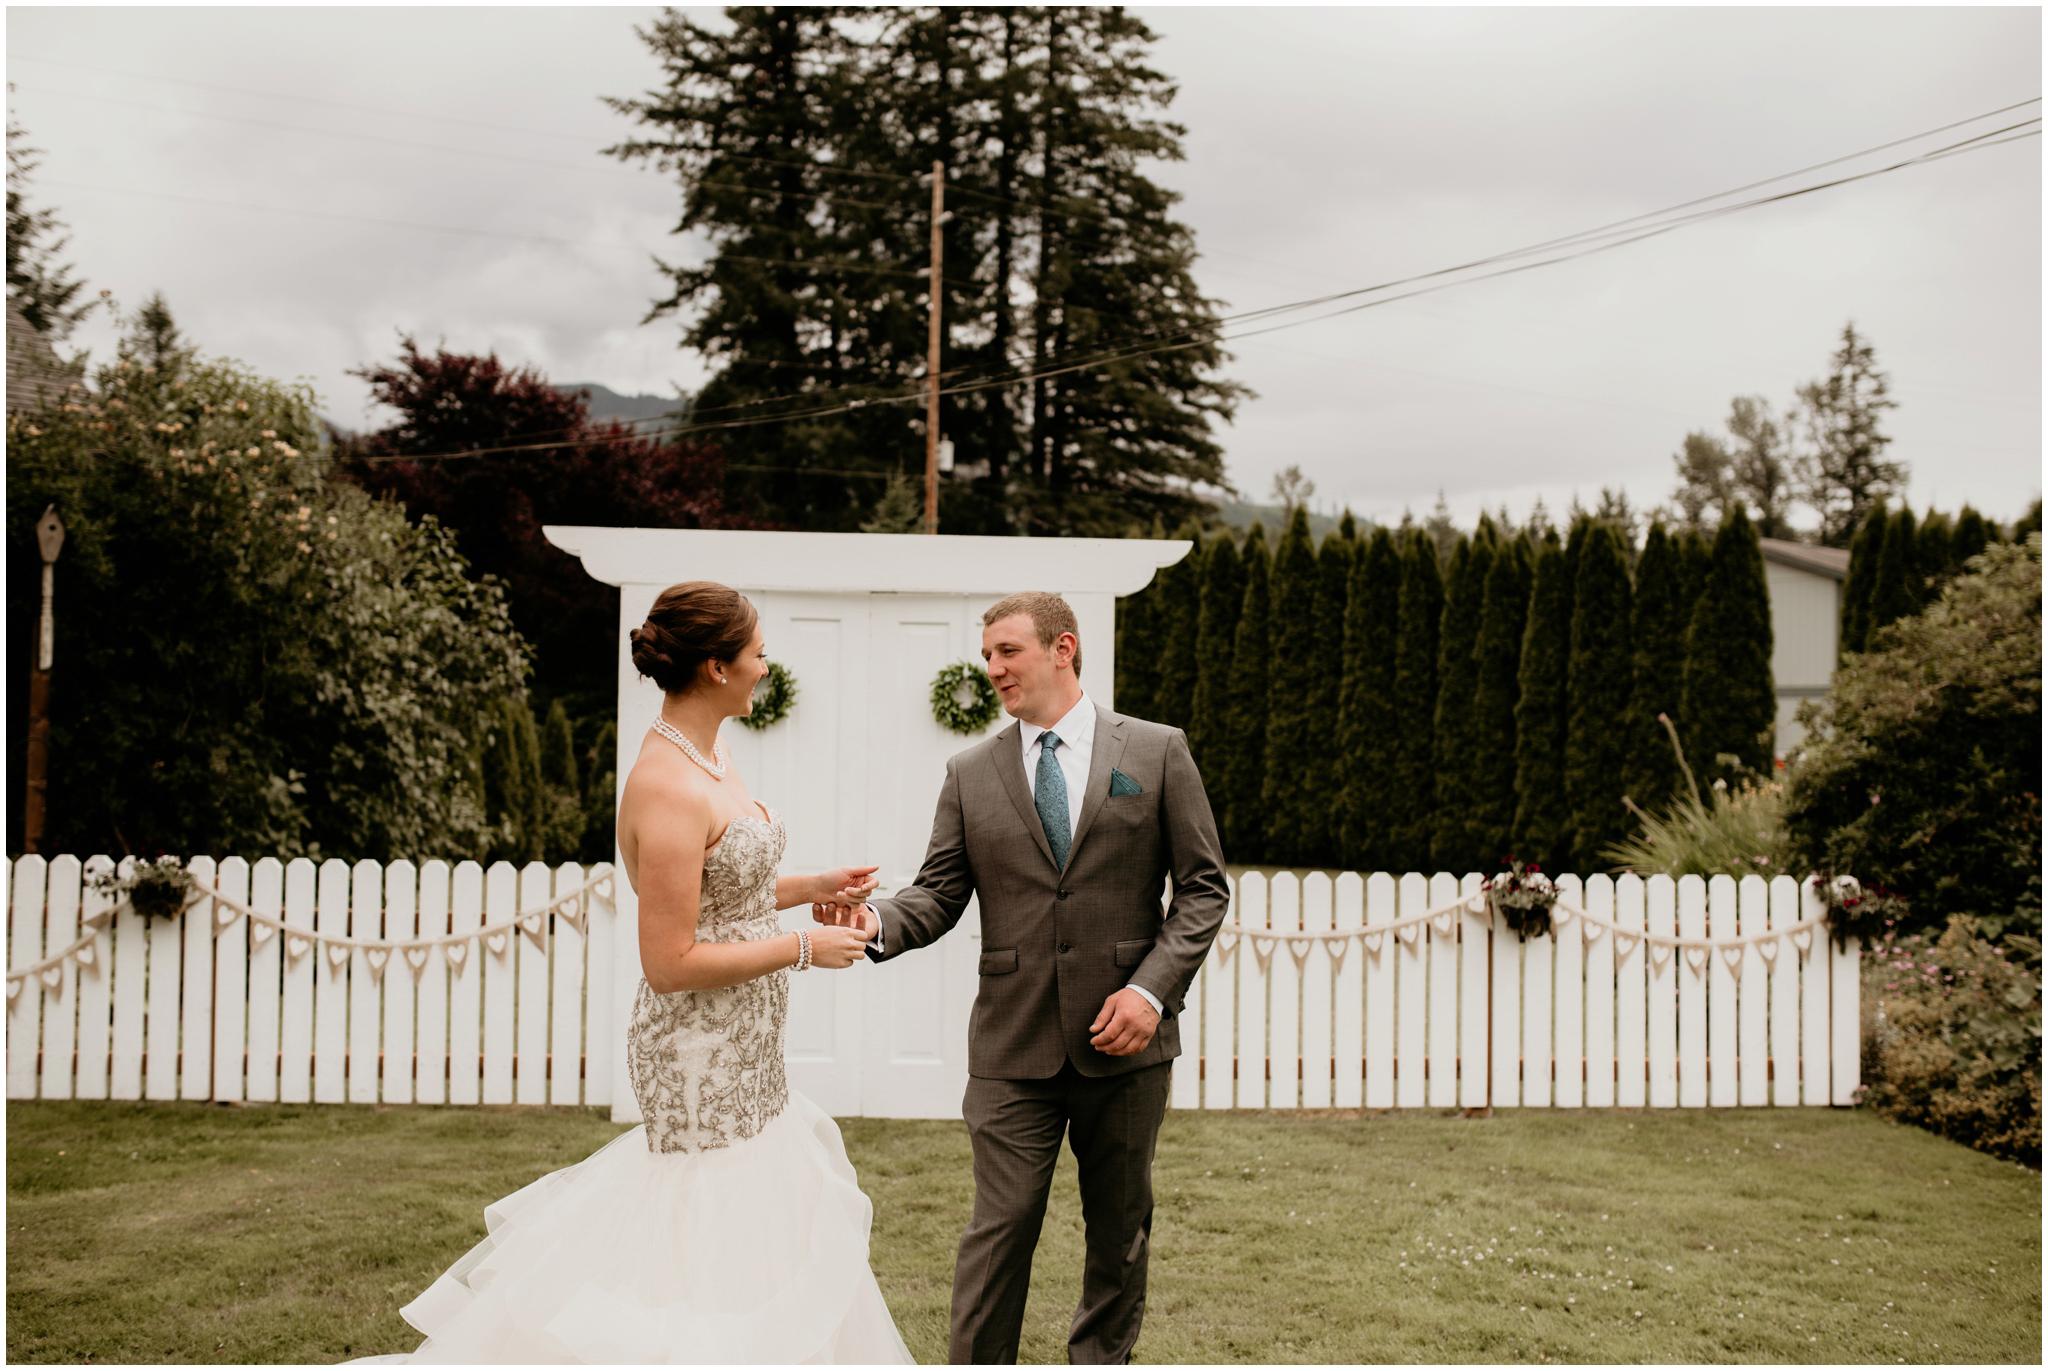 alex-and-matthew-three-cs-farm-venue-seattle-wedding-photographer-036.jpg